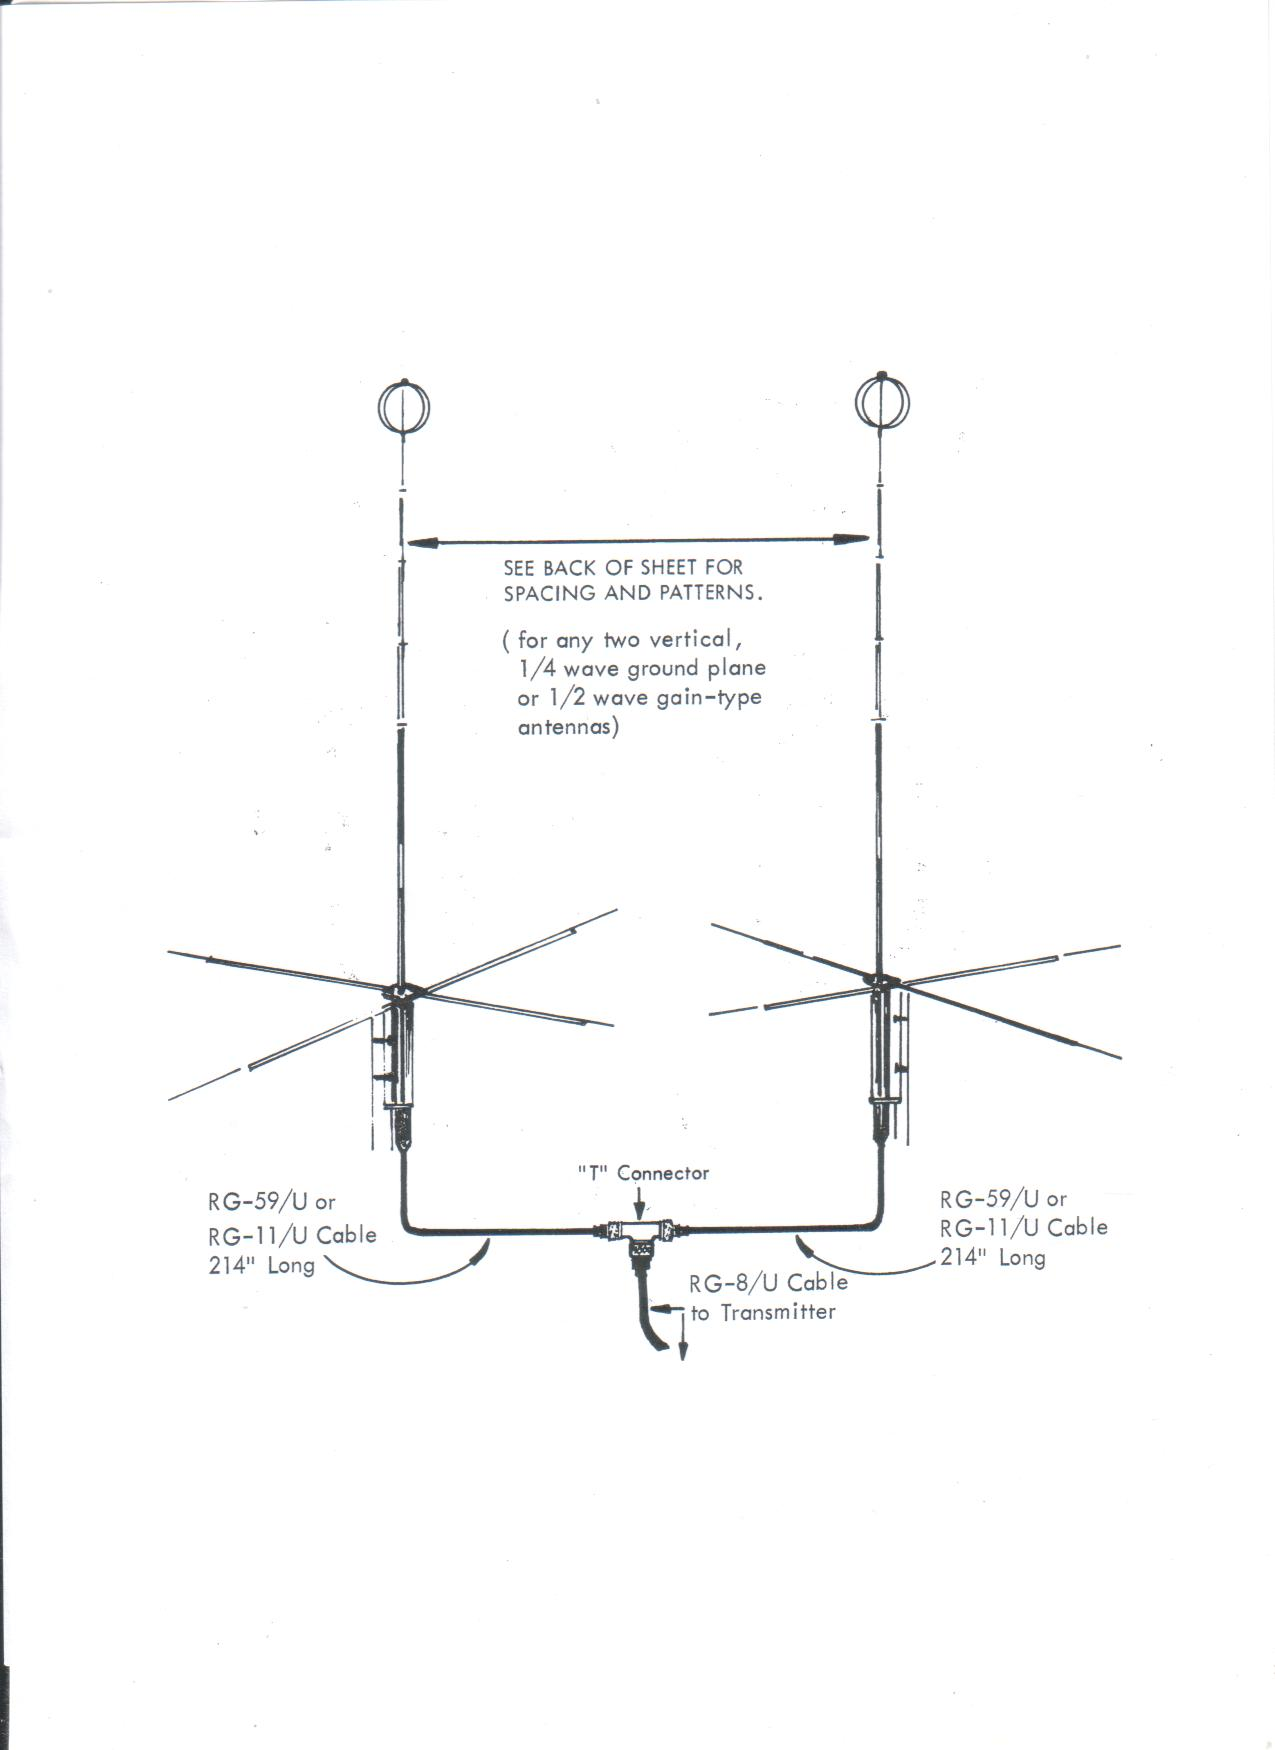 er plane videos with Co Phased Antennas on ShowFile besides Co Phased Antennas additionally Vulkan Ansichten Des Pla en Merkur additionally Plane park furthermore Pla en.